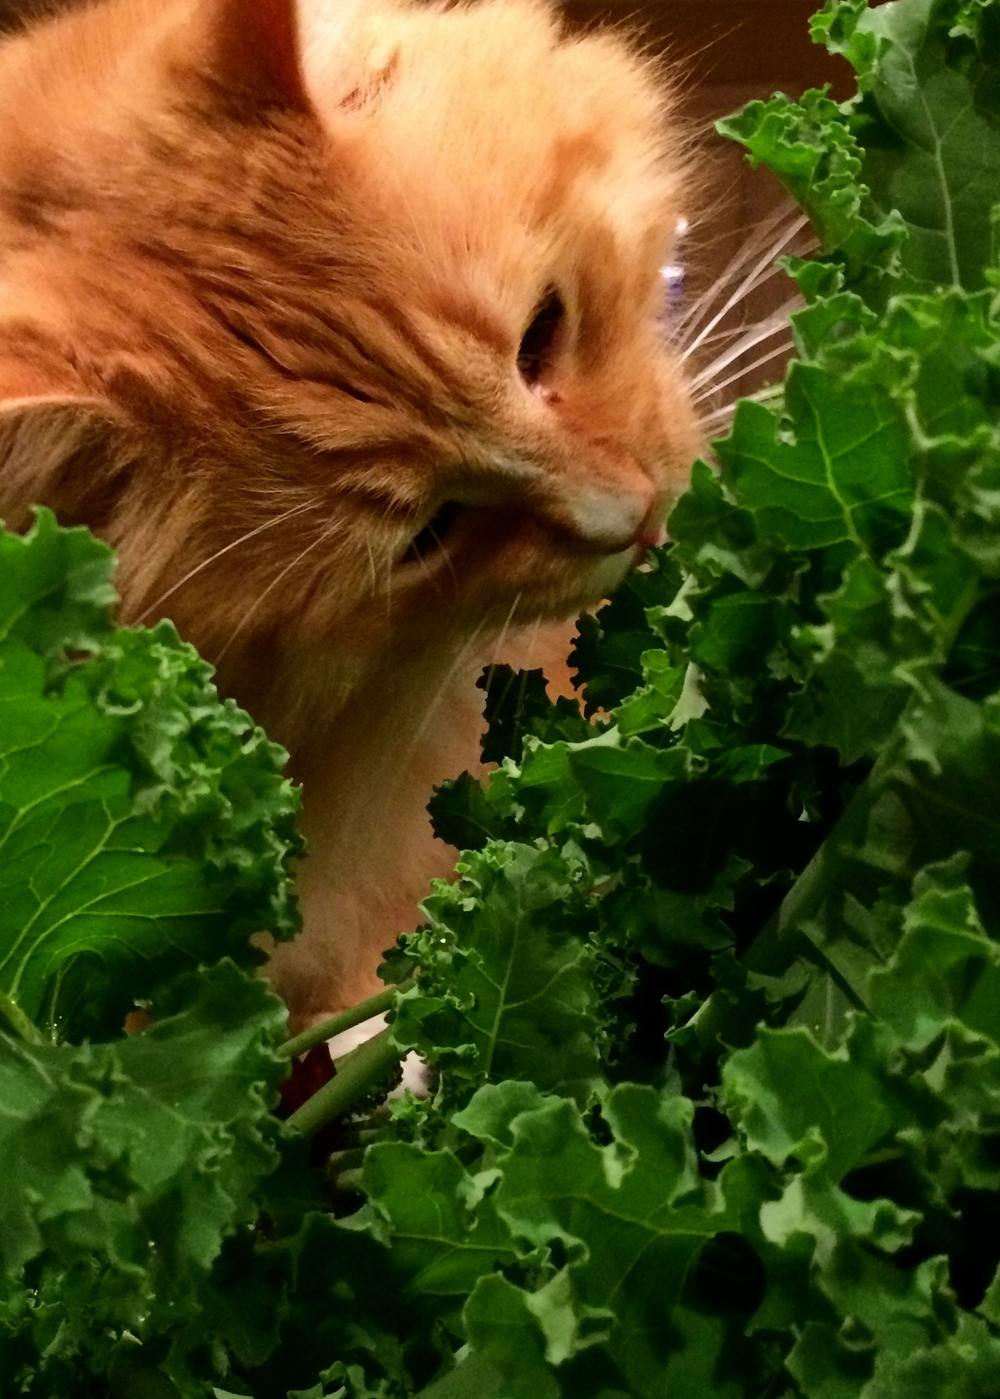 Photo: Tumbles the giant orange rescue cat discovering kale